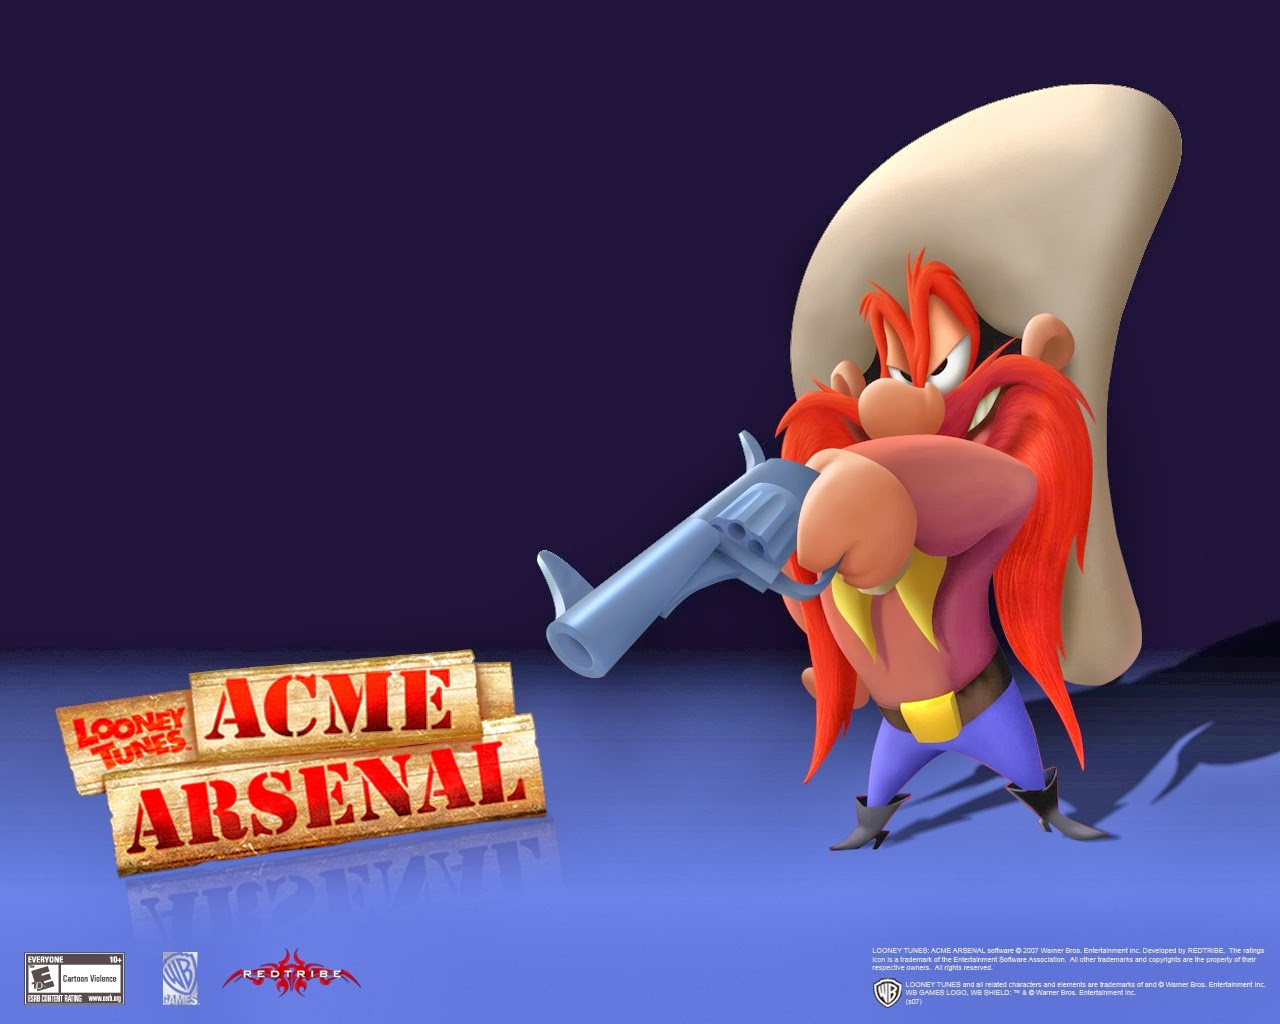 Looney Tunes Yosemite Sam Cartoons